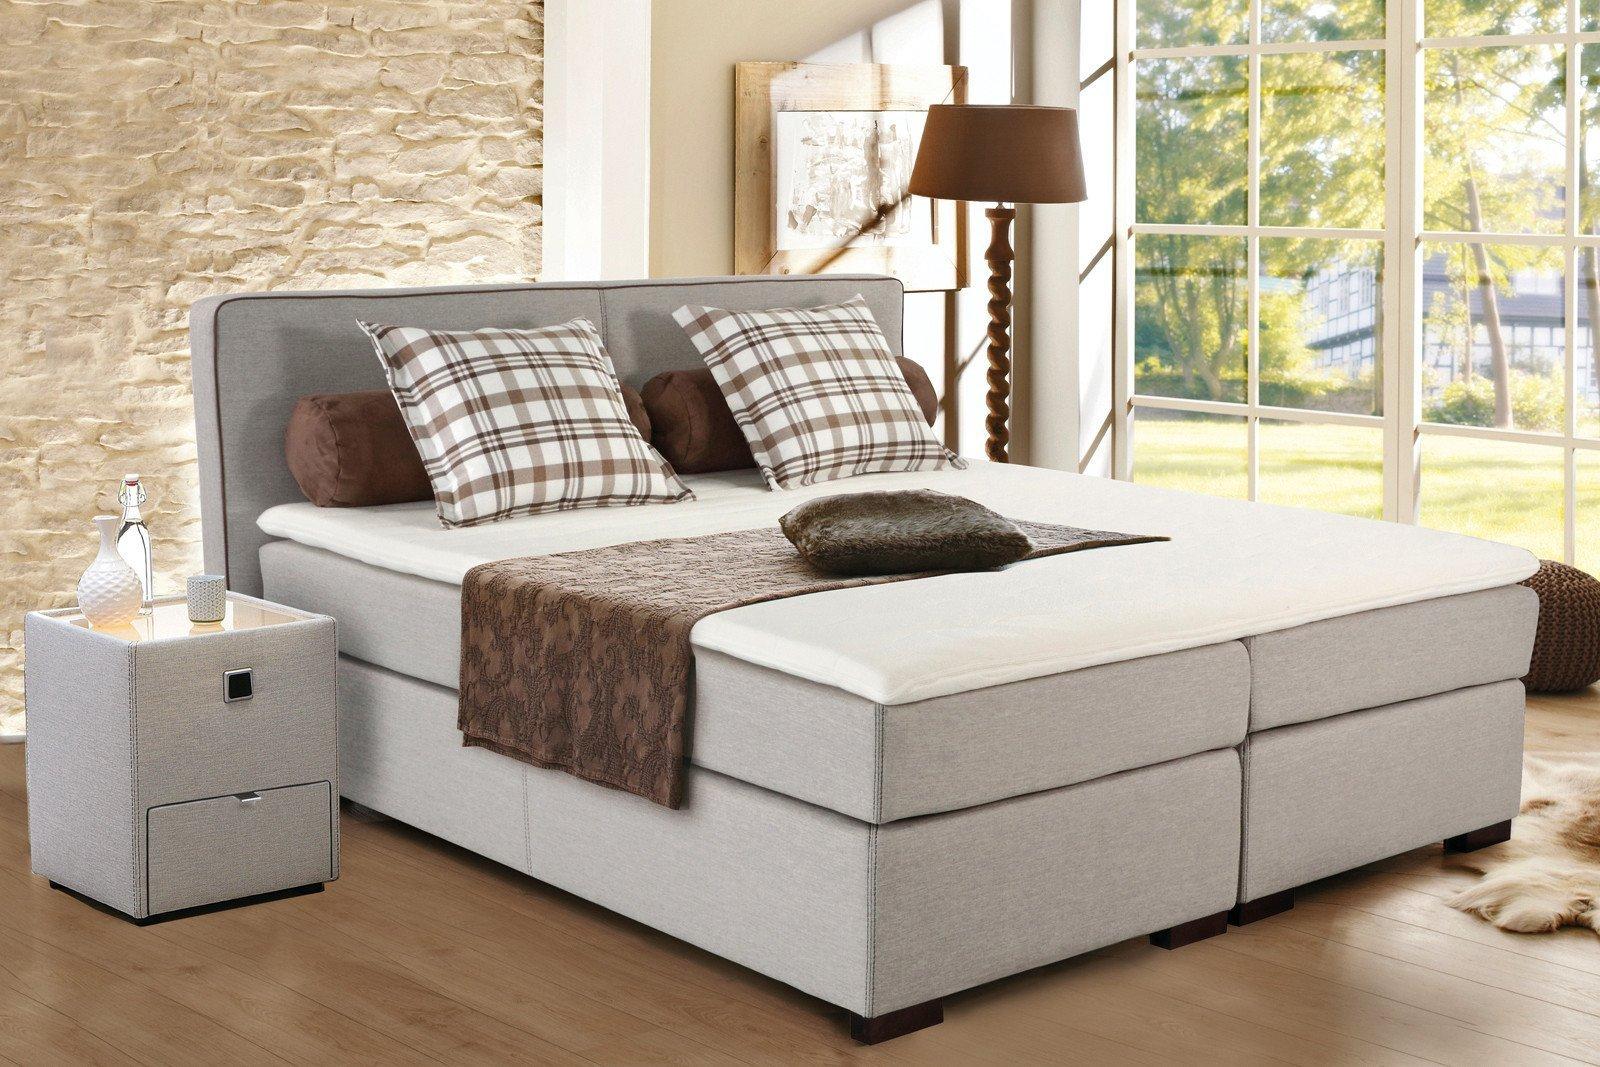 boxspringbett romantica von jockenh fer m bel letz ihr online shop. Black Bedroom Furniture Sets. Home Design Ideas